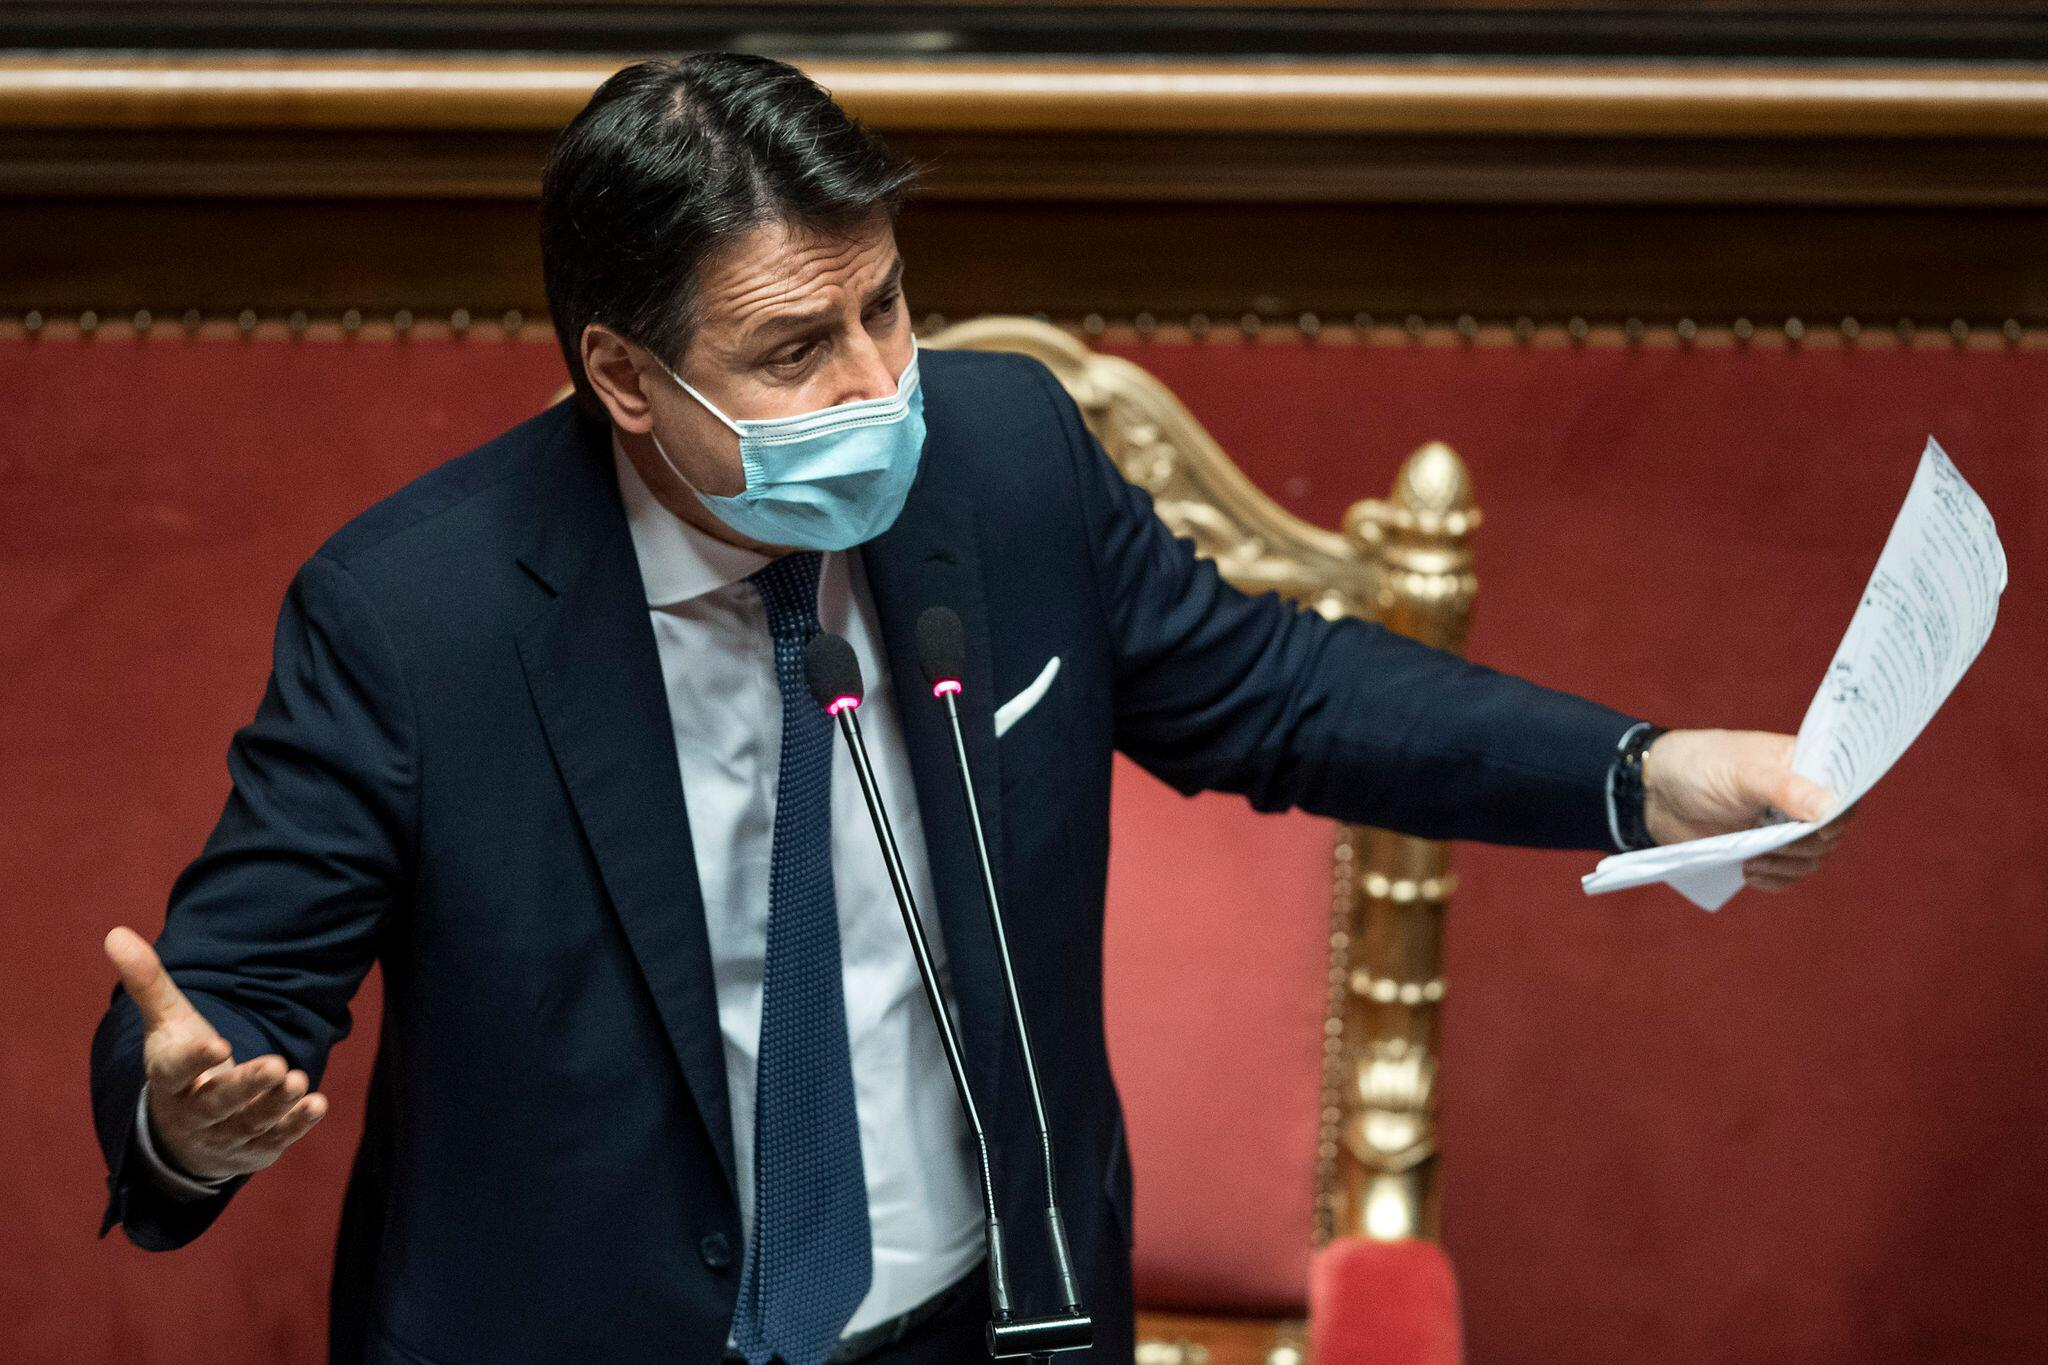 Italien: Ministerpräsident Conte will zurücktreten - Politik